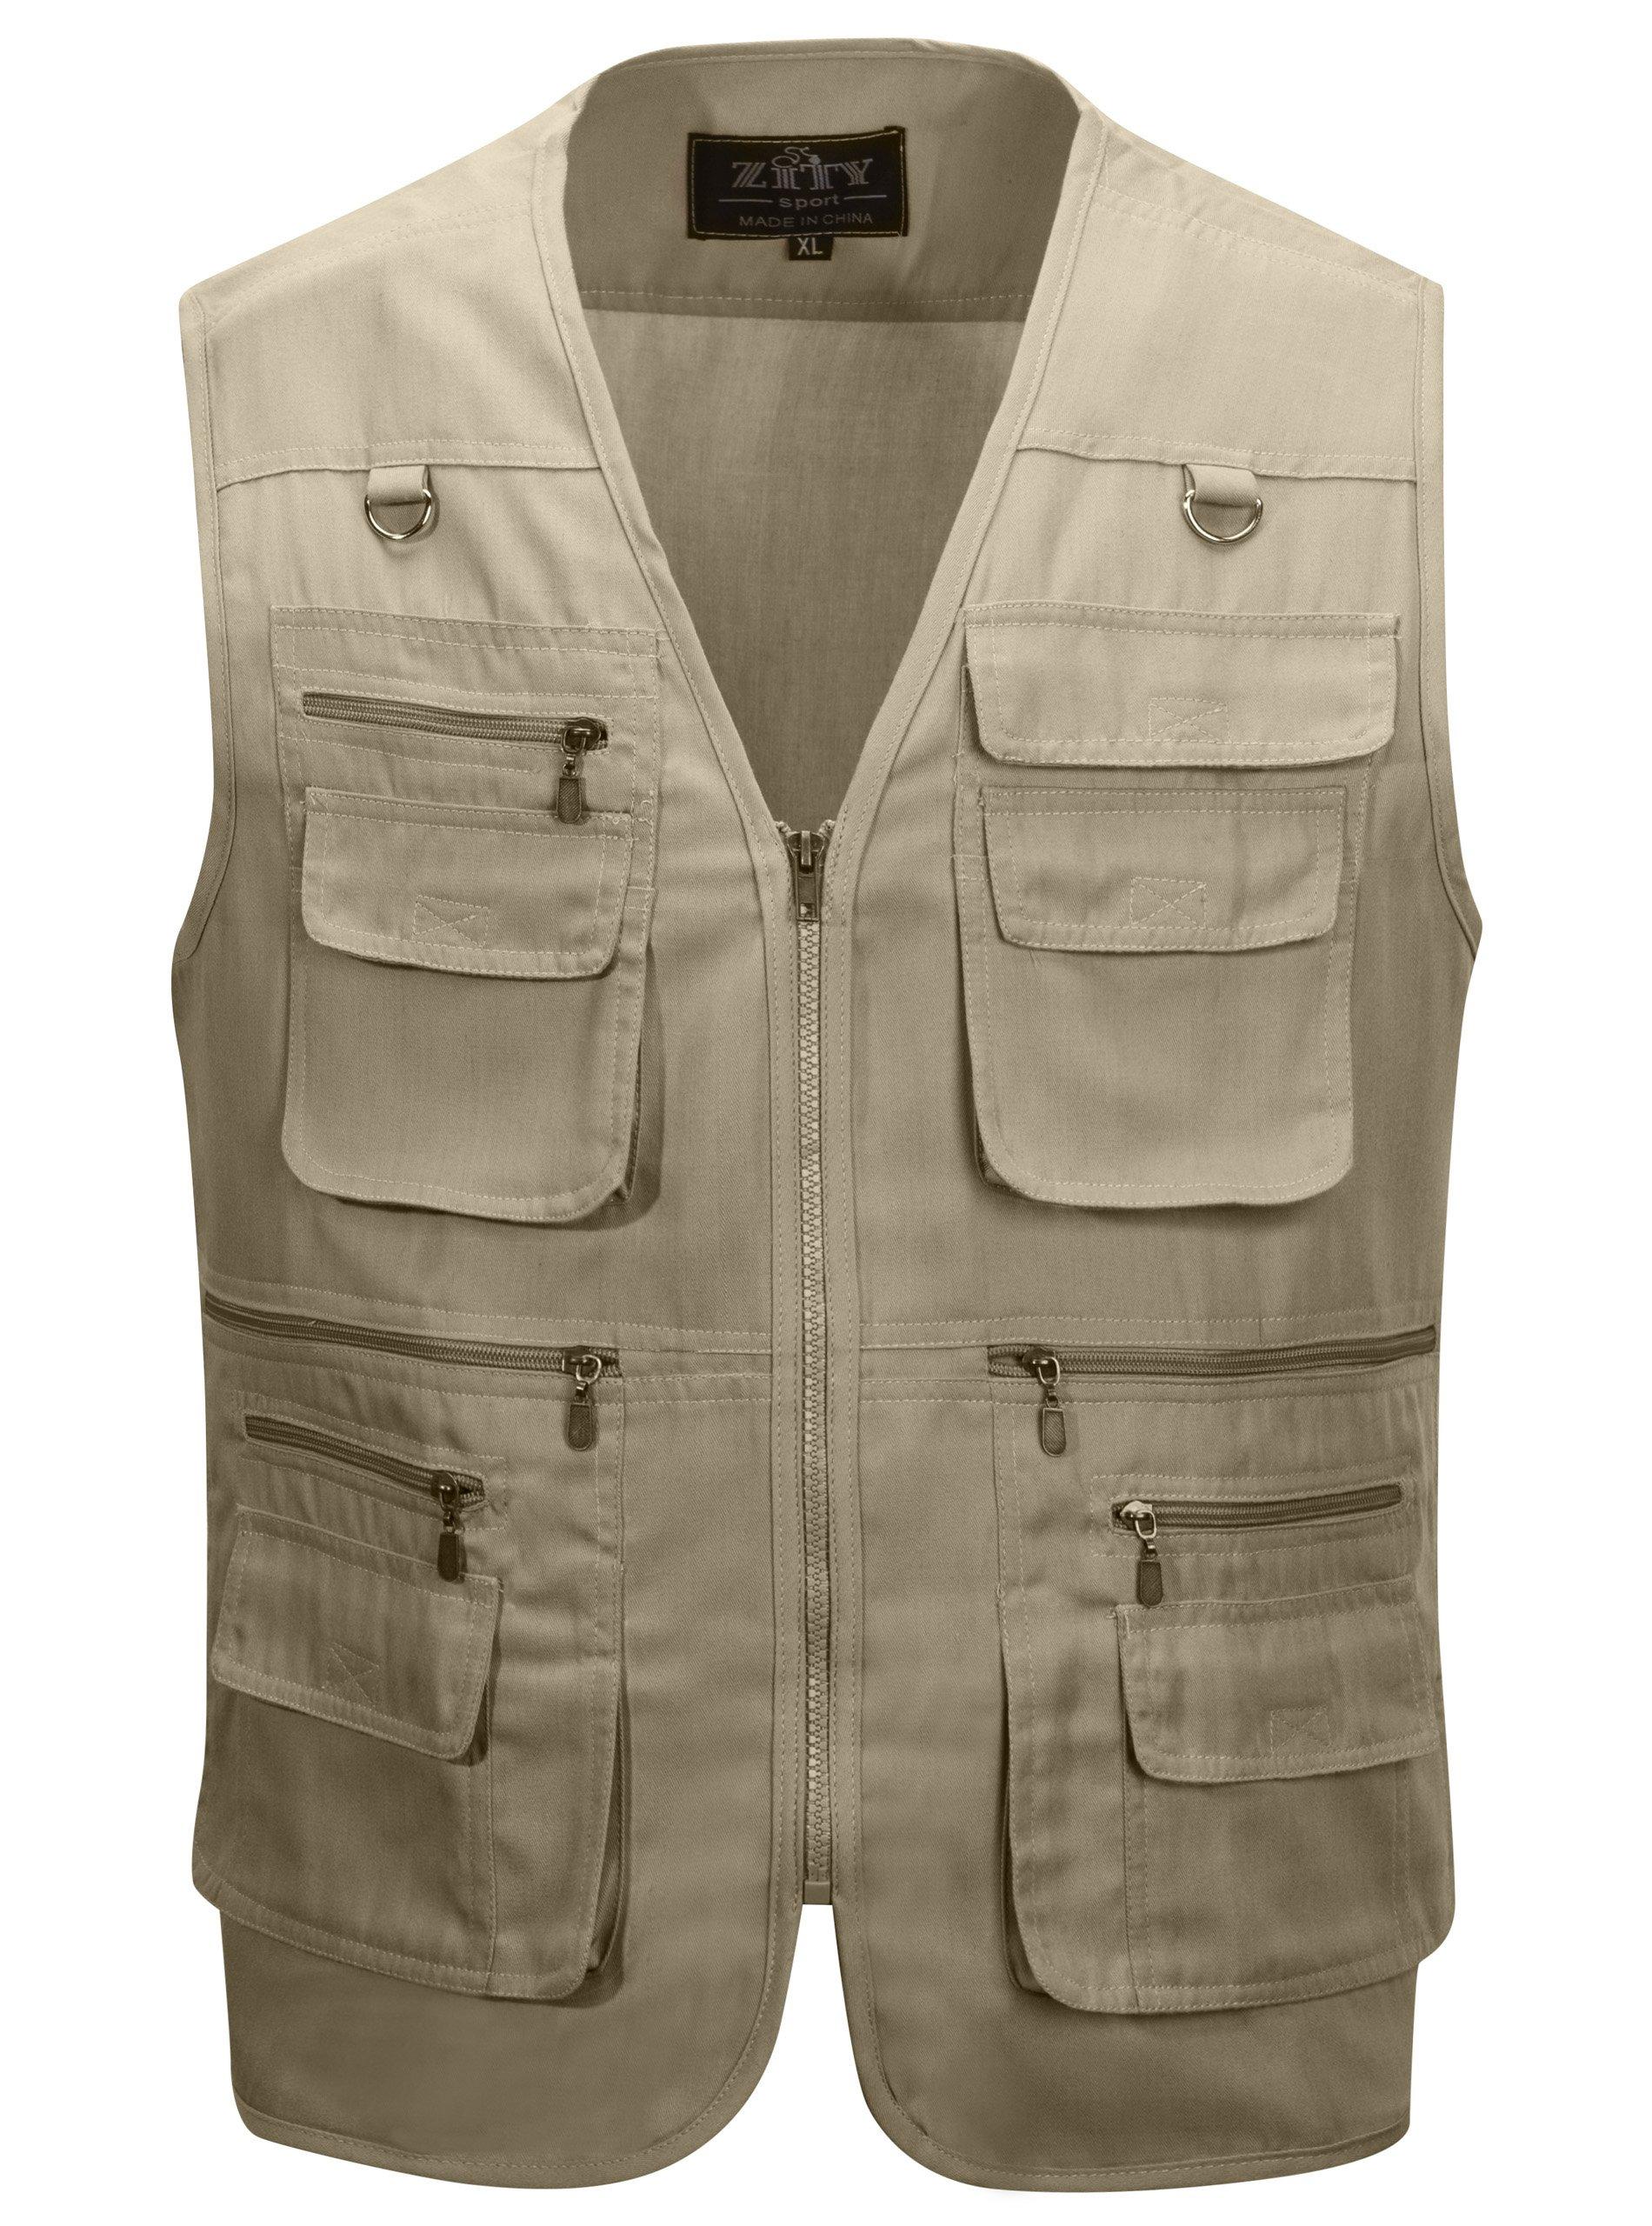 Alipolo Men's Outdoor Multifunction Multi-Pocket Pierced Fishing Vest Photo Journalist's Vest Khaki US L/Label 2XL by Alipolo